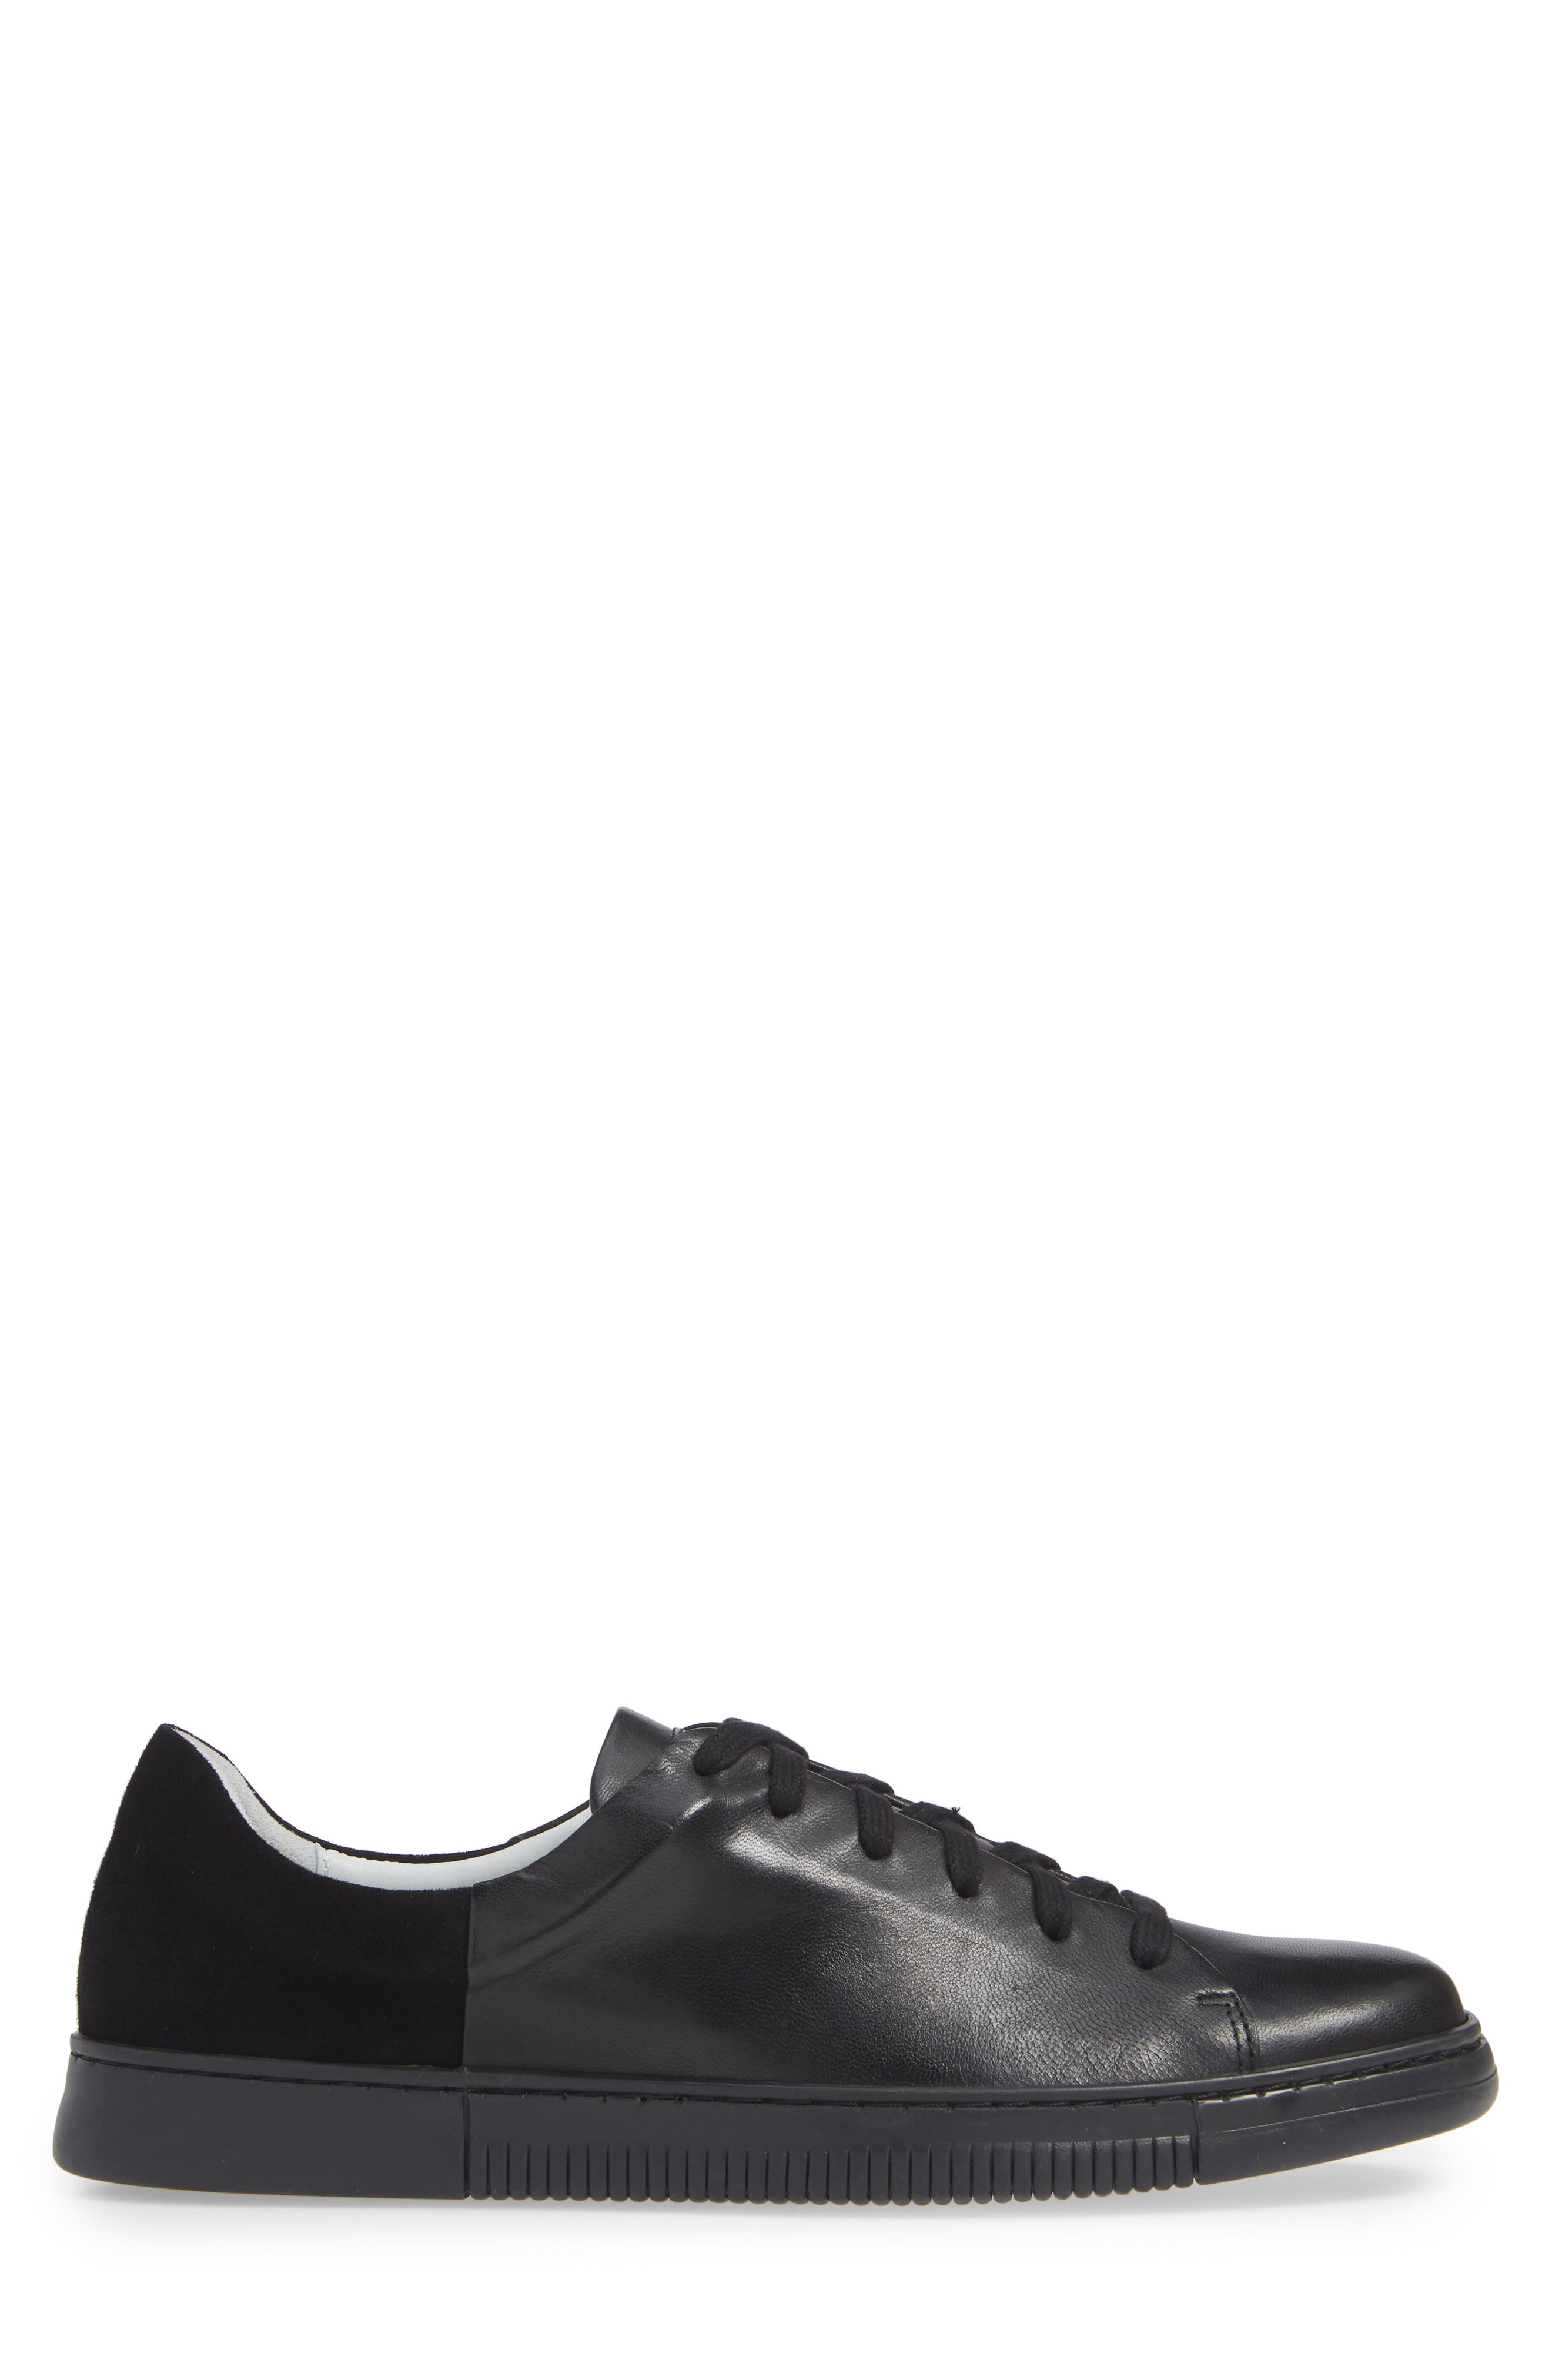 VINCE CAMUTO,                             Jito Sneaker,                             Alternate thumbnail 3, color,                             BLACK LEATHER